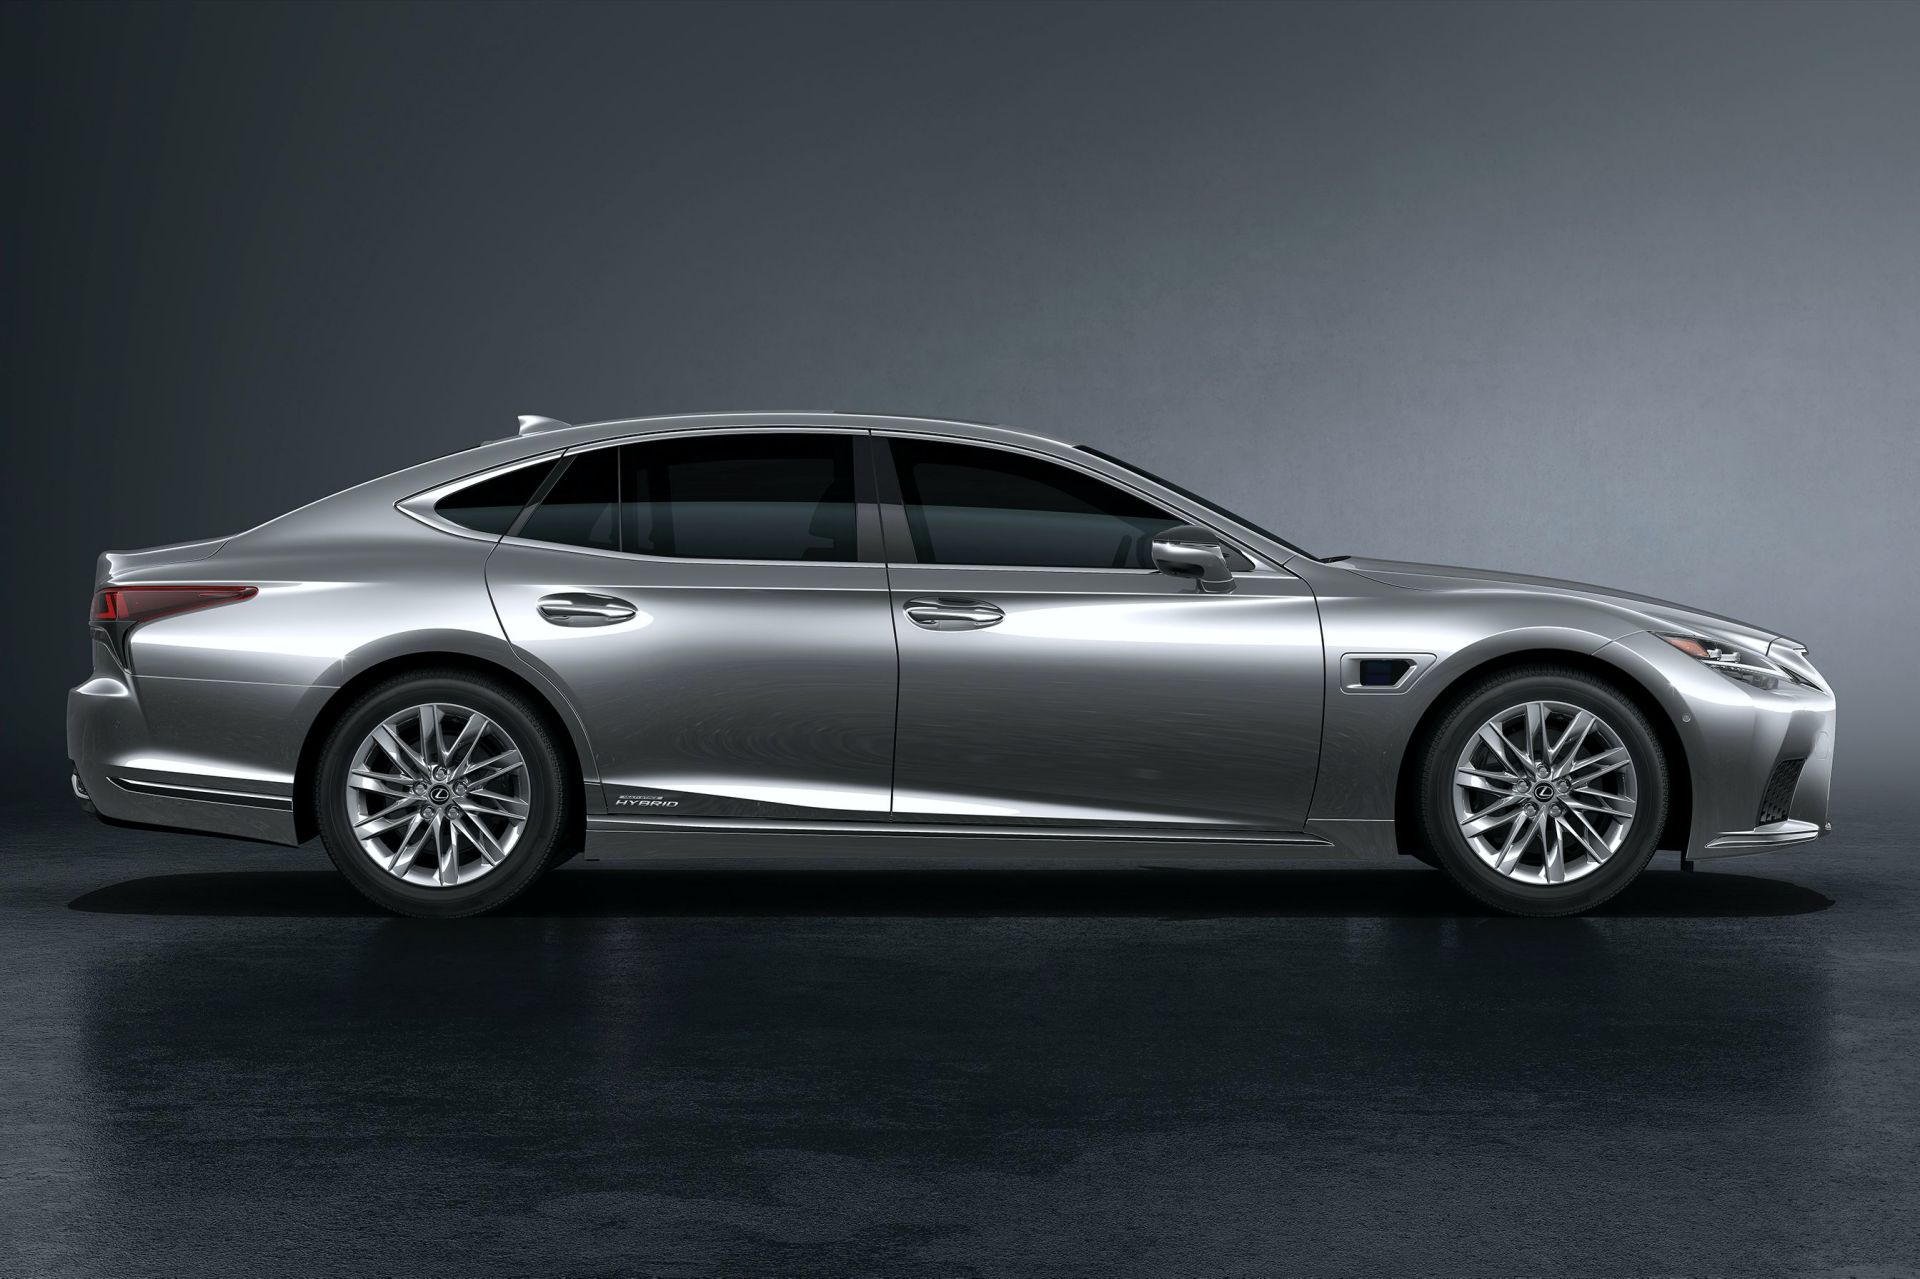 2021-lexus-ls-facelift-3.jpg